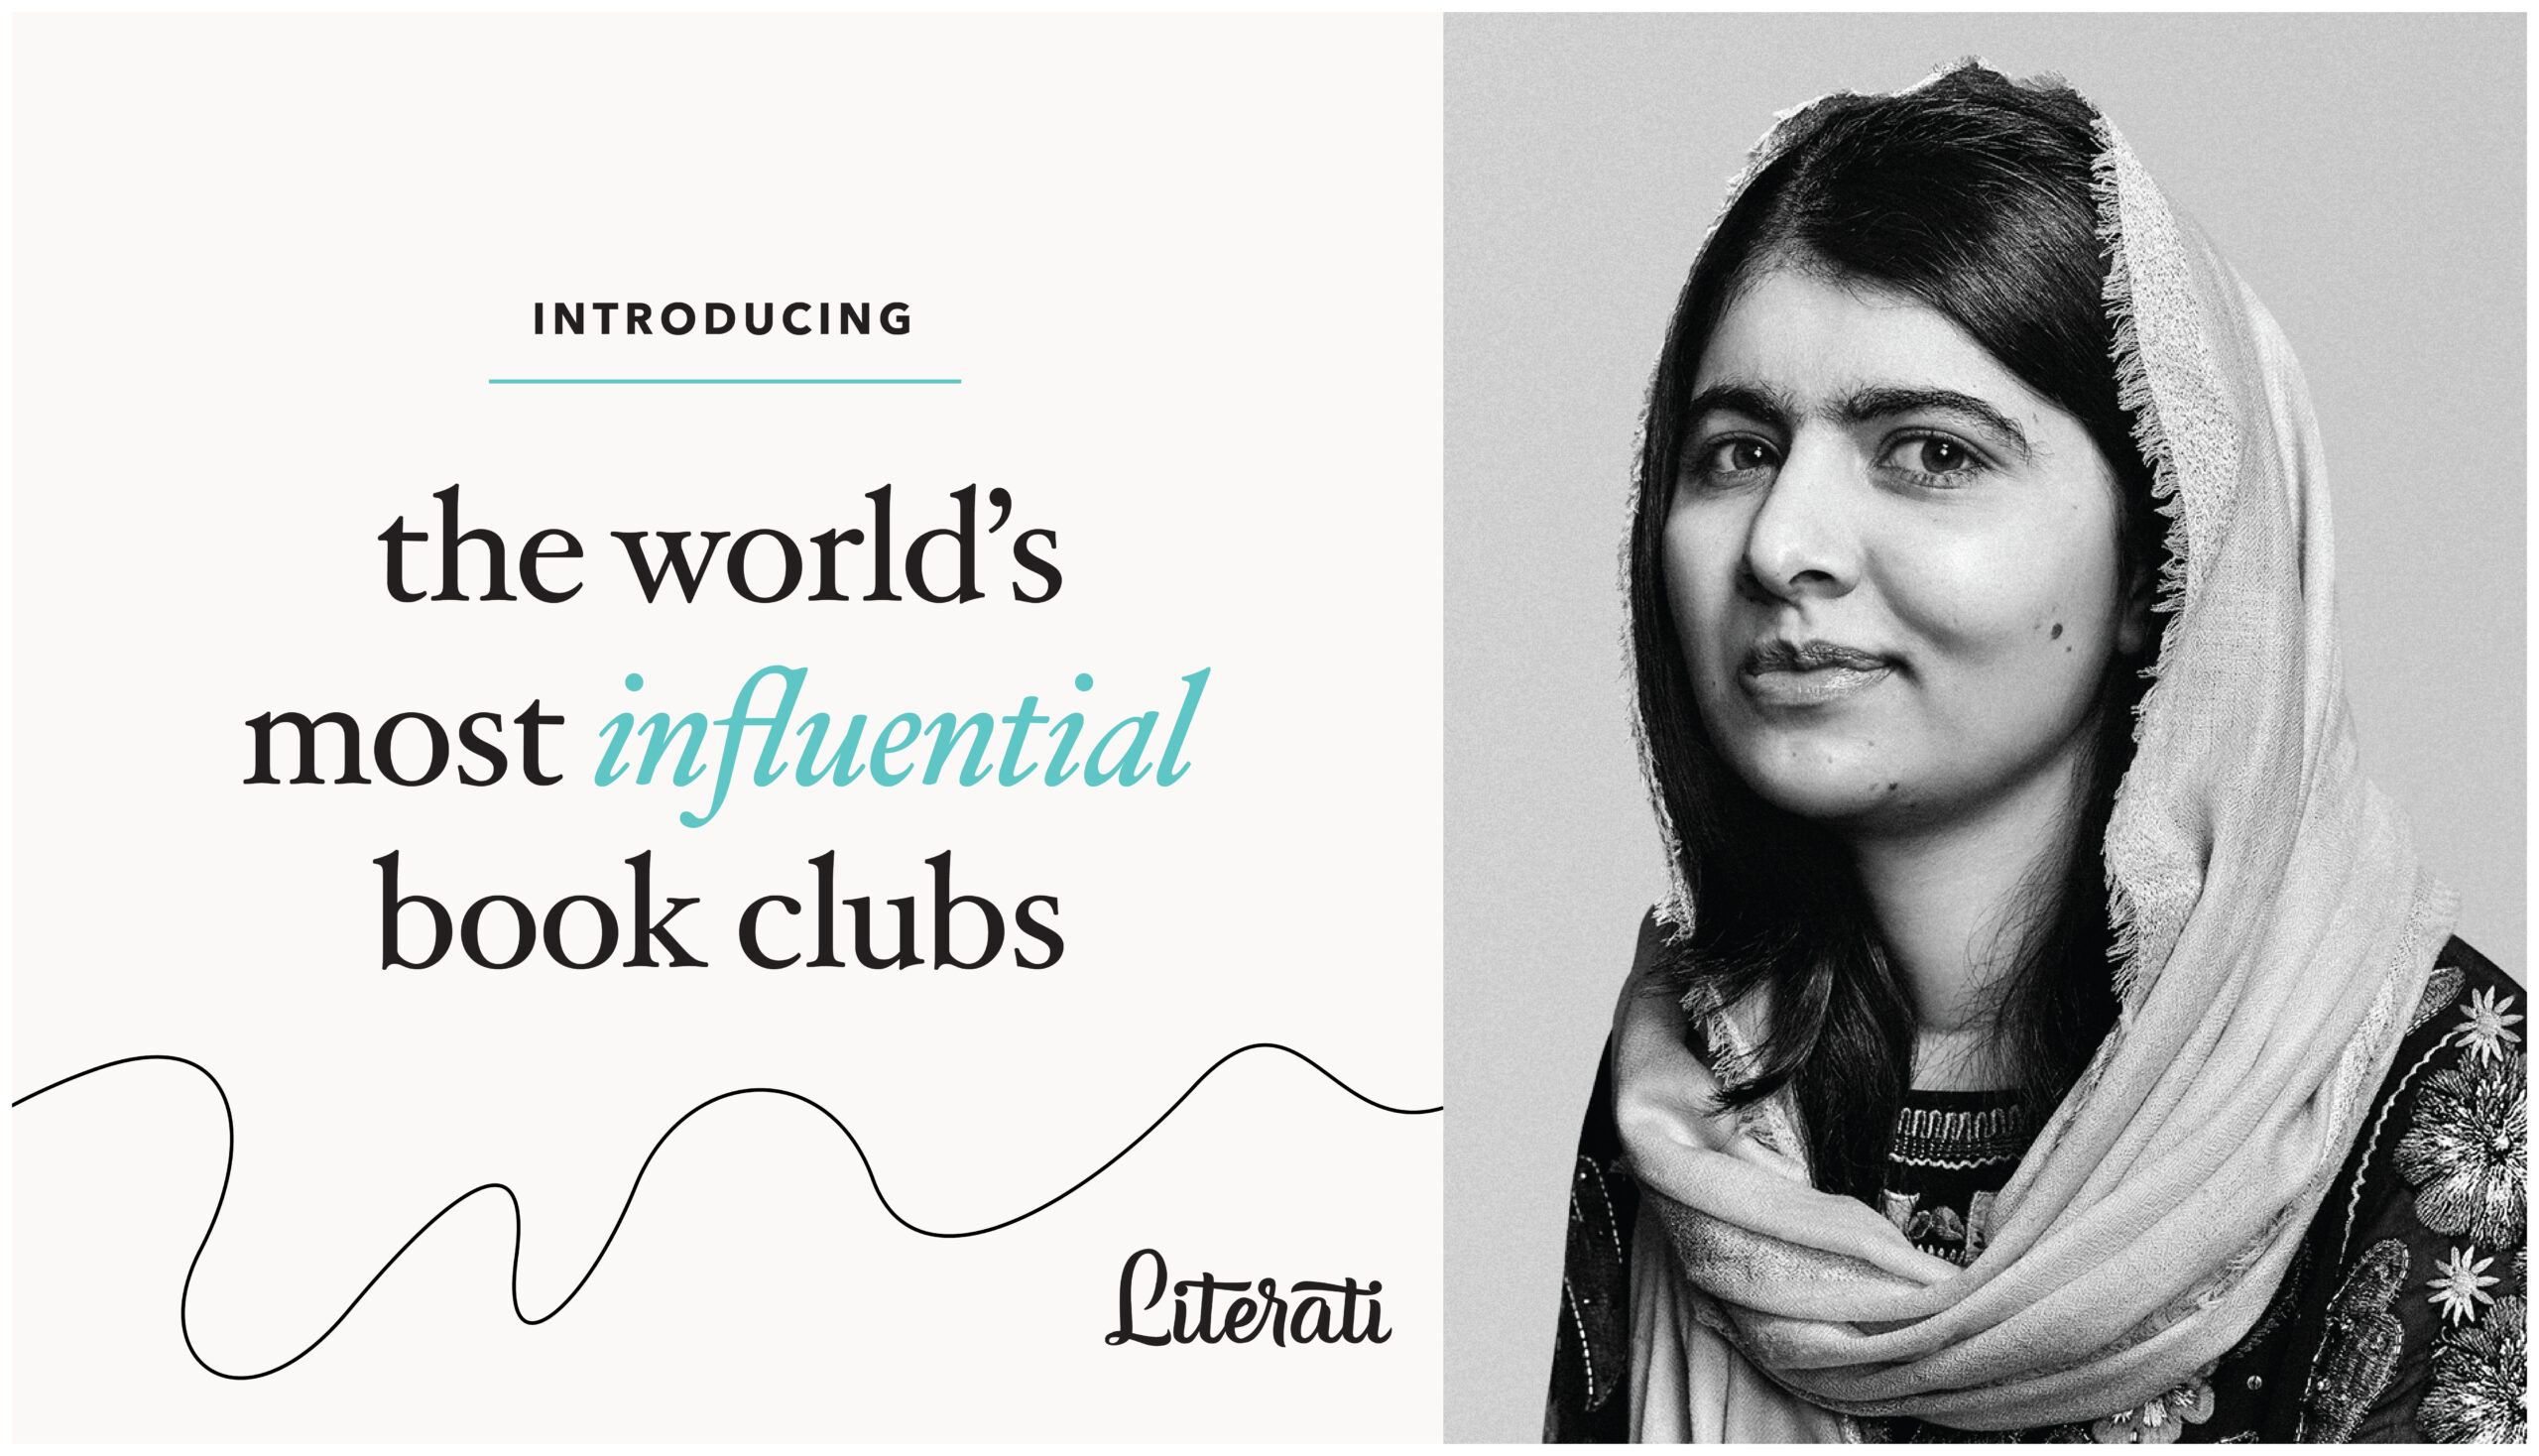 Malala Yousafzai's club Literati book club